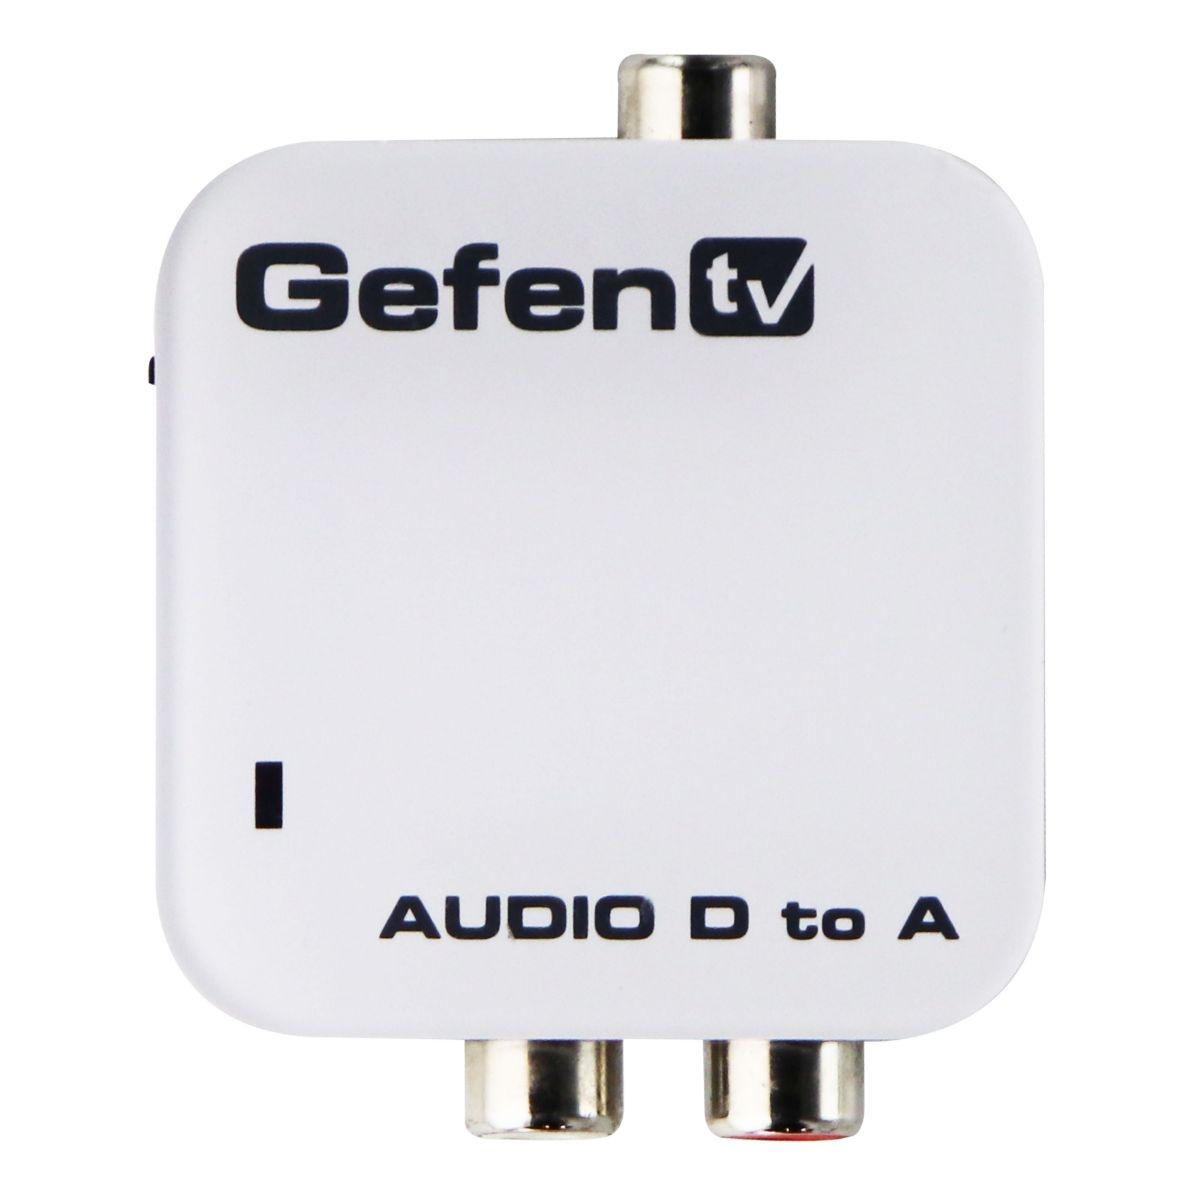 Gefen - Digital Audio to Analog Audio Adapter/Converter